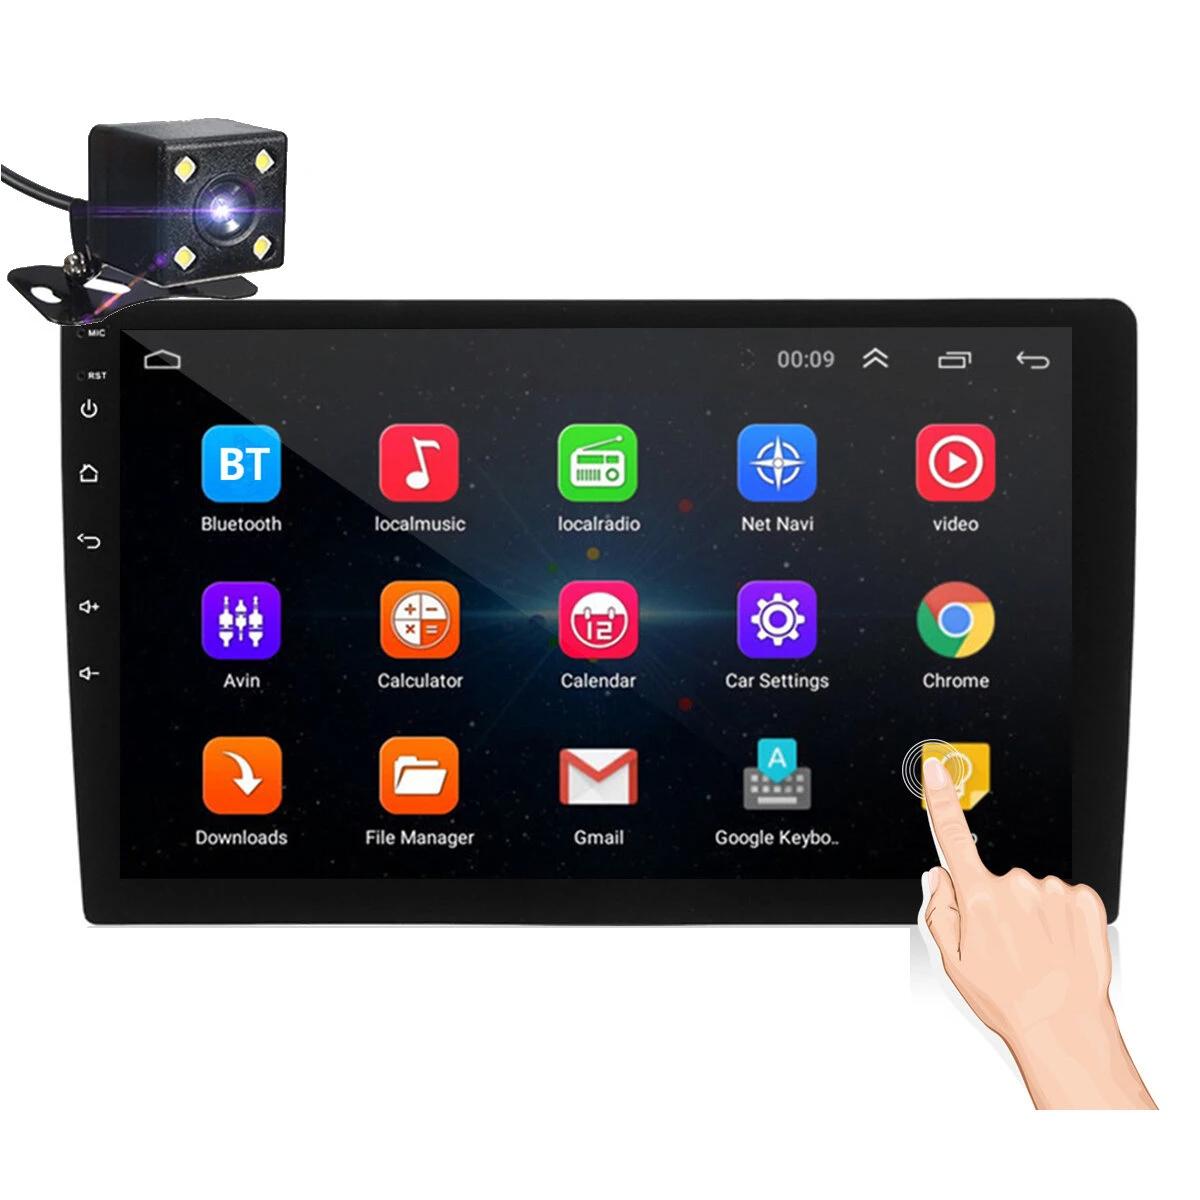 "IMars 10.1"" 2DIN авто Магнітола Android 8.1, GPS, WIFI, Bluetooth + камера заднього виду"